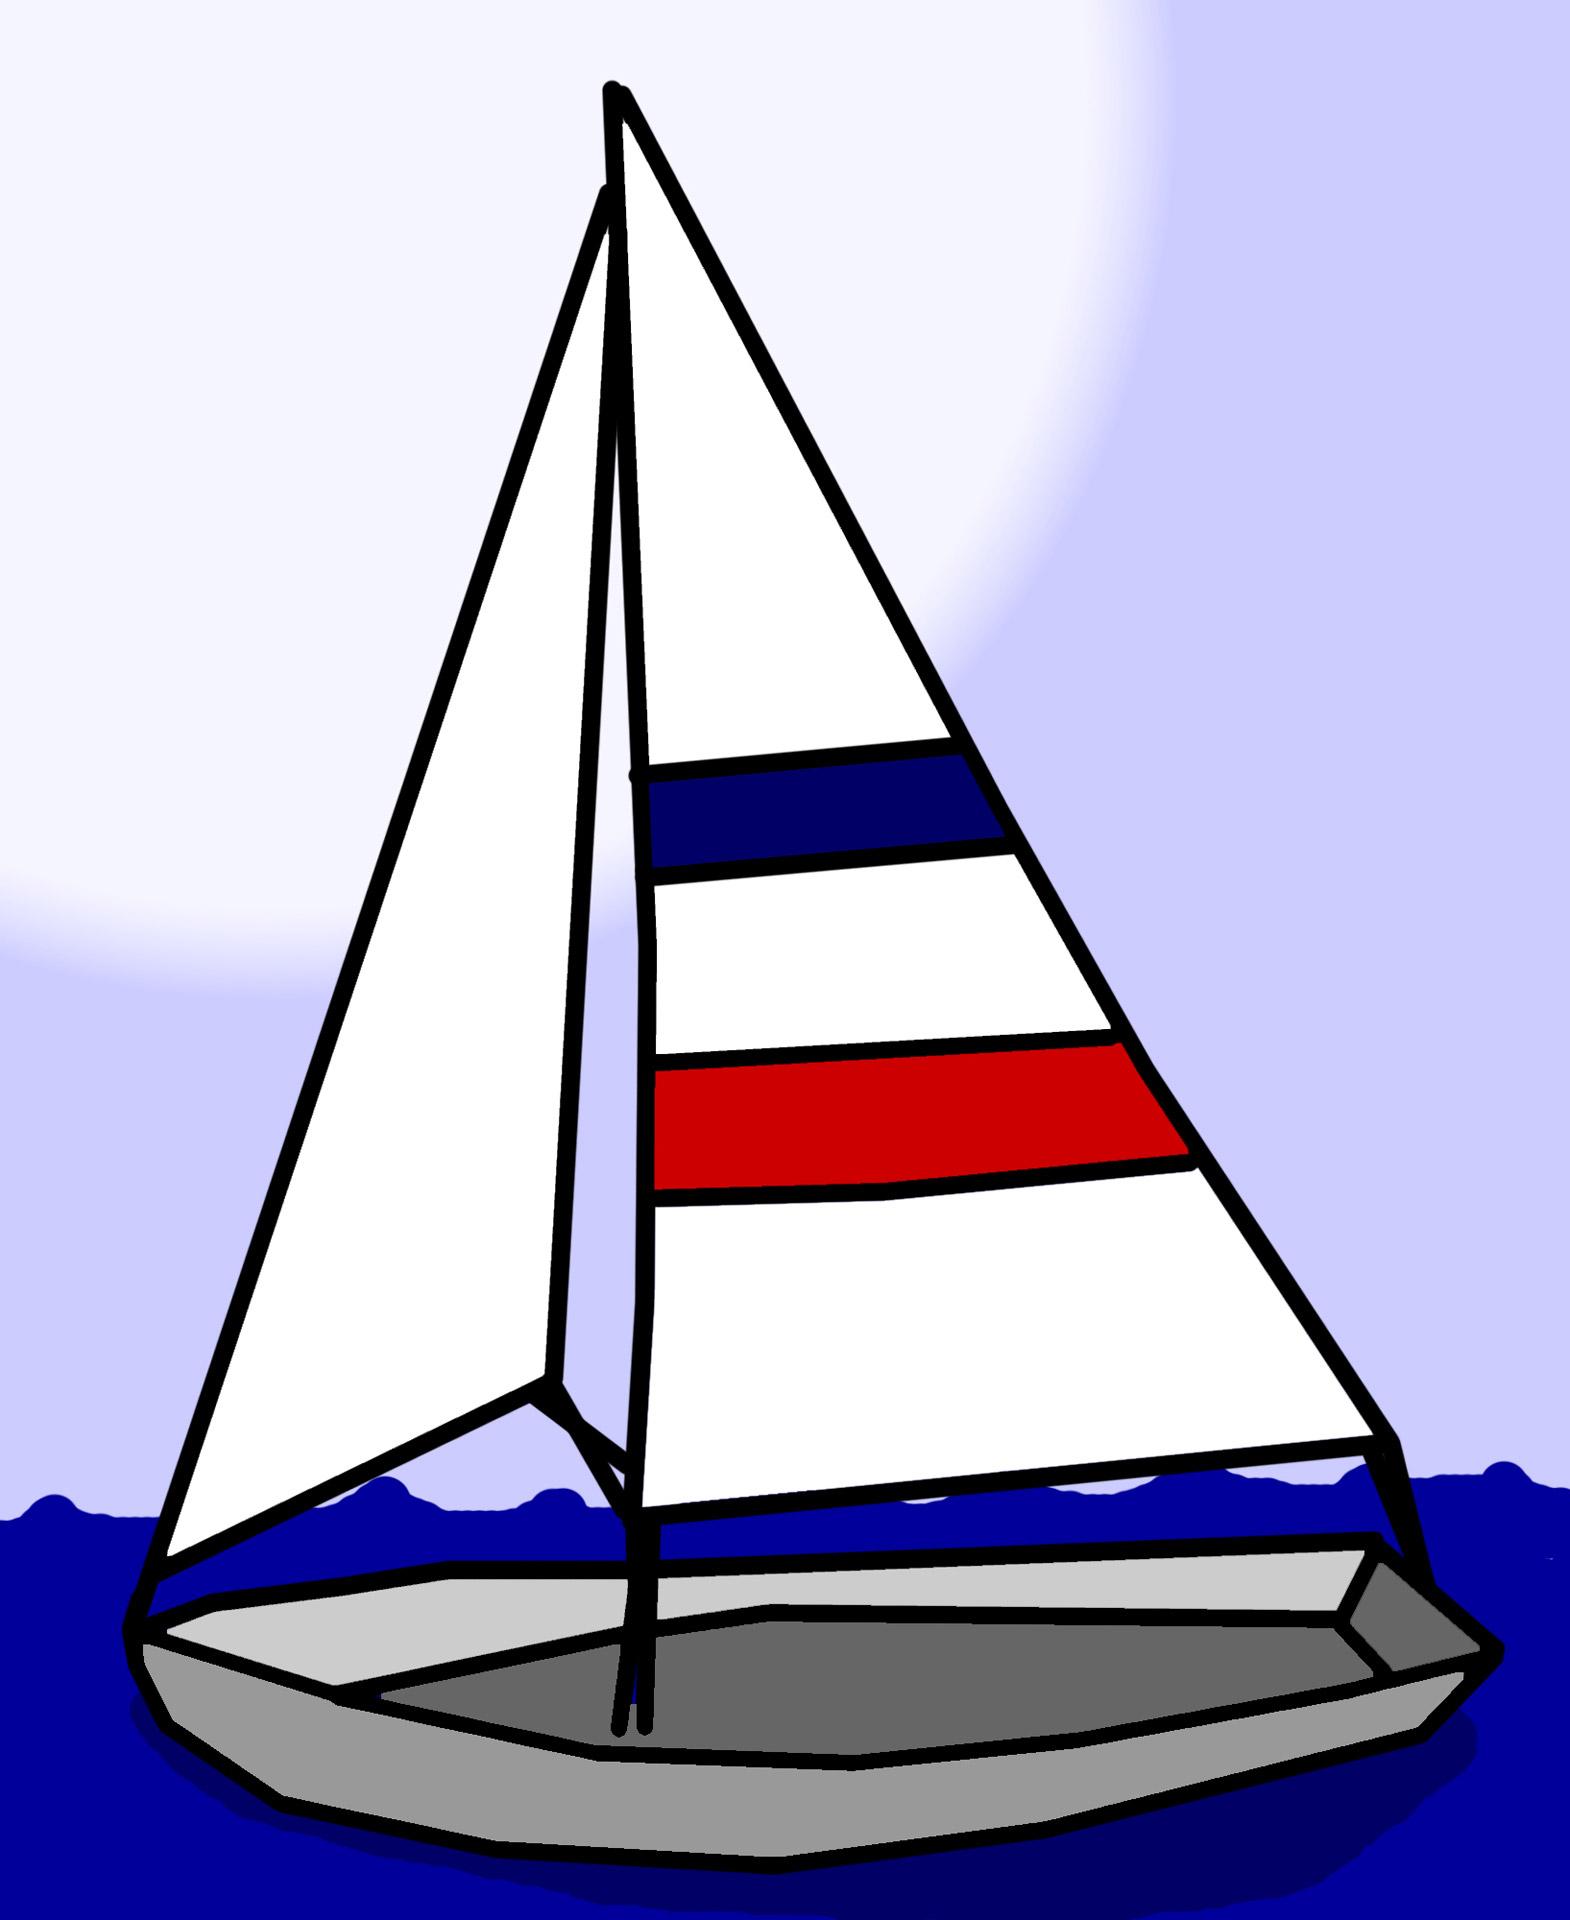 hight resolution of sailboat clip art free stock photo